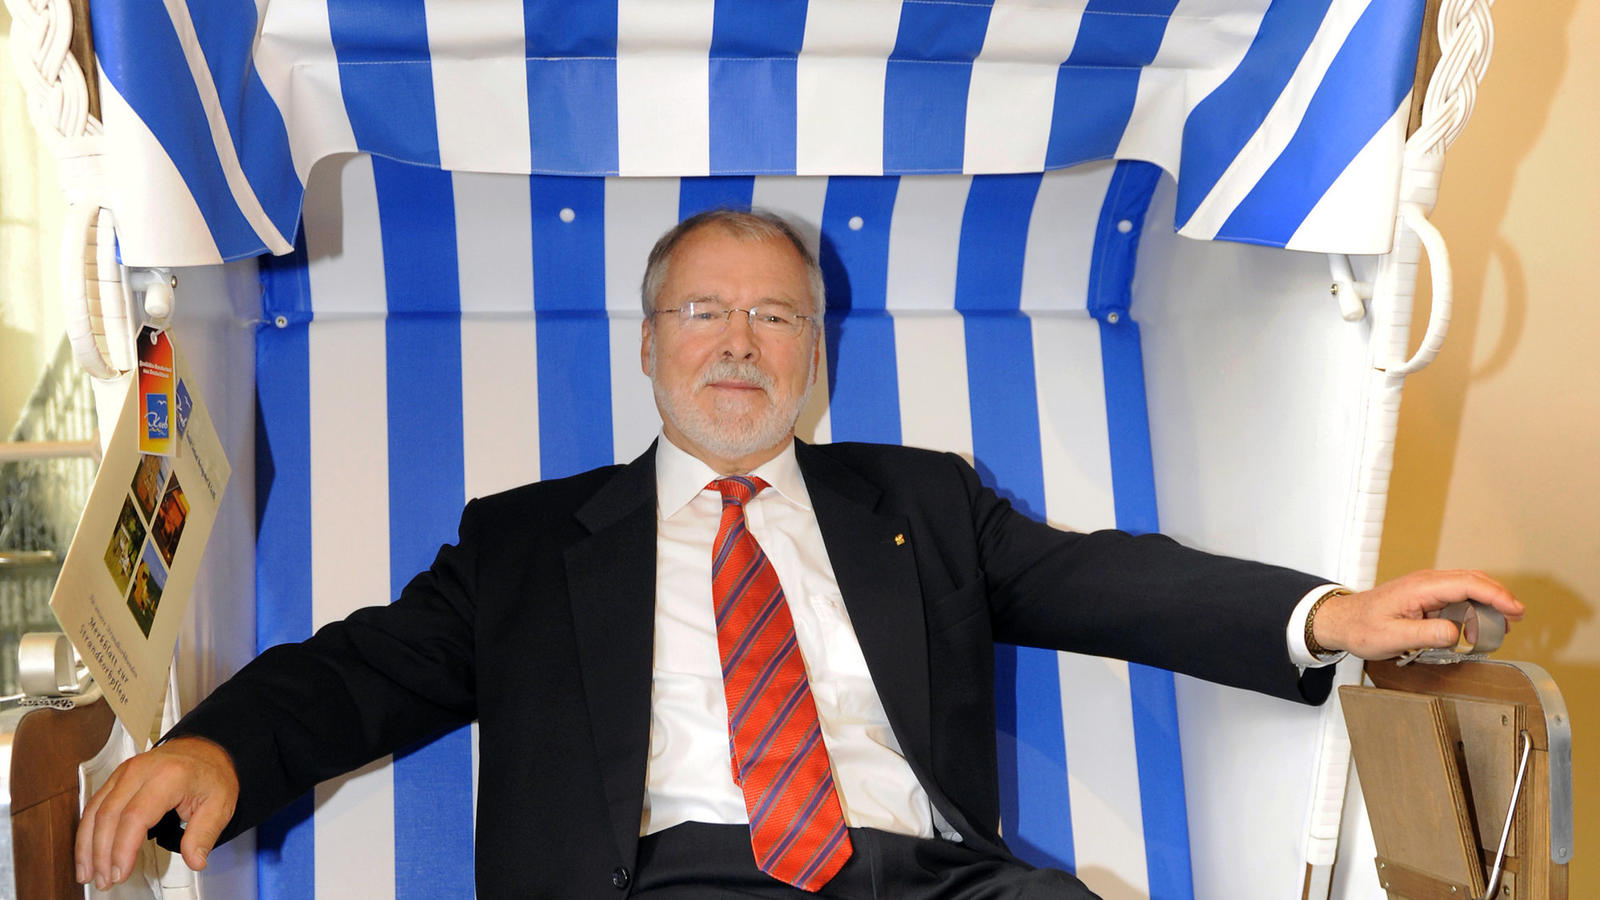 Harald Ringstorff gestorben